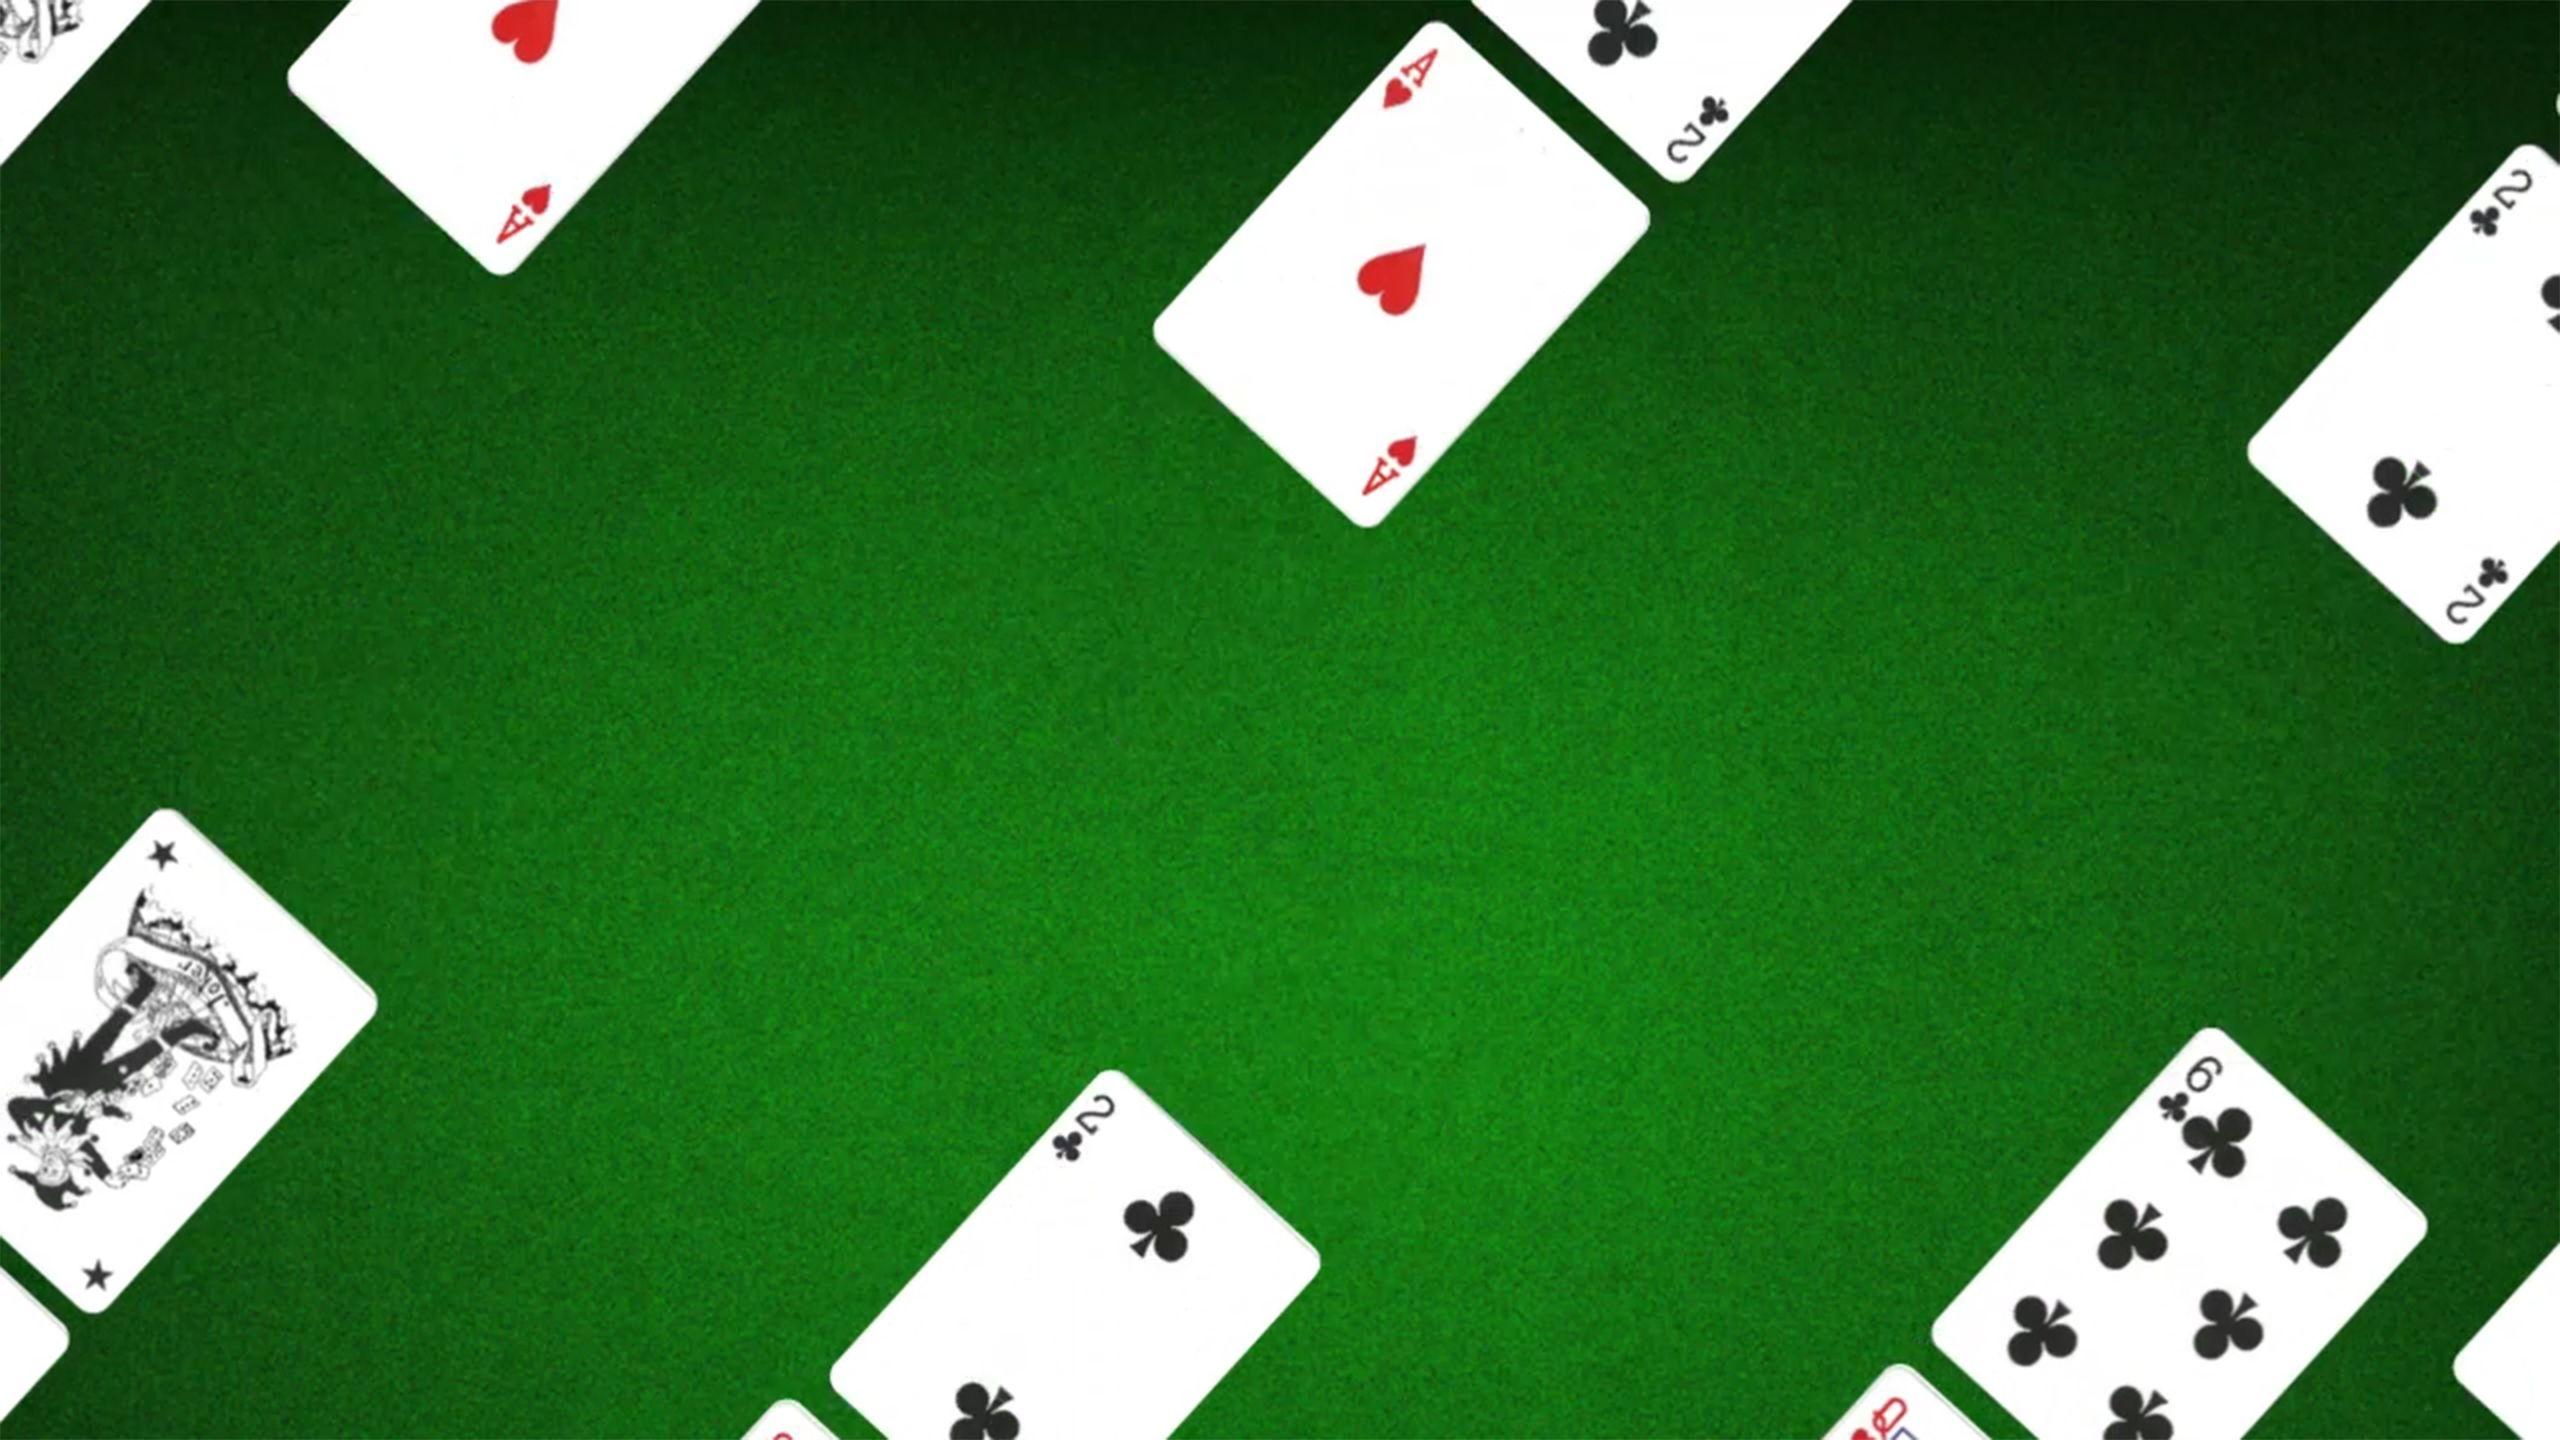 Гонки игры онлайн покер онлайн игры игровые автоматы 777